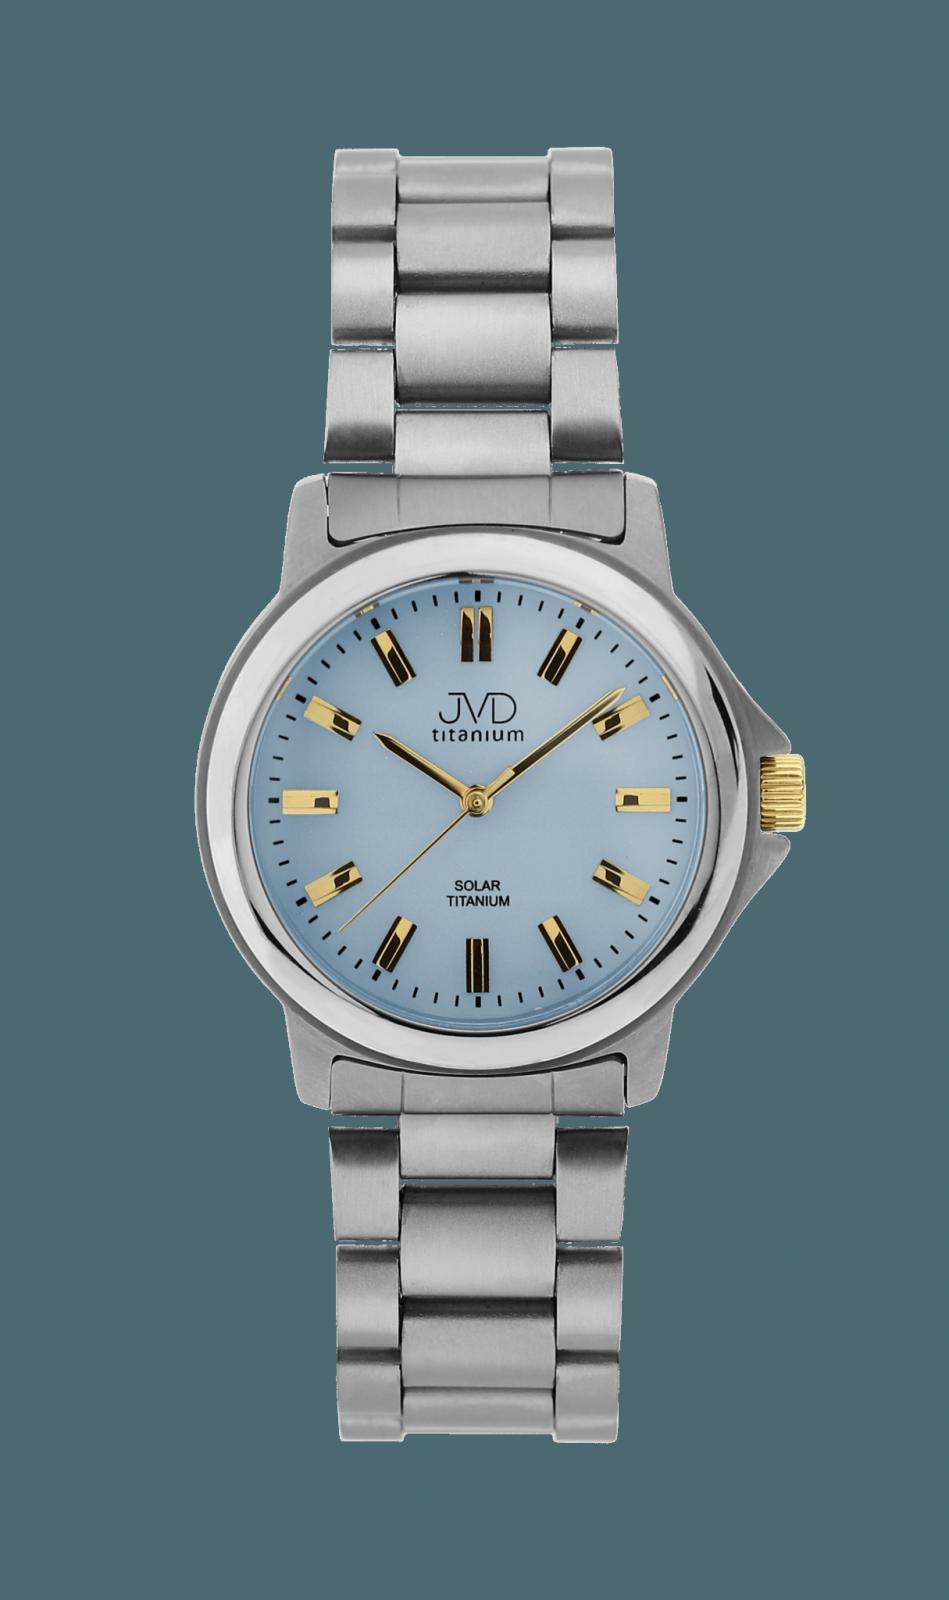 Náramkové hodinky JVD titanium J2015.3